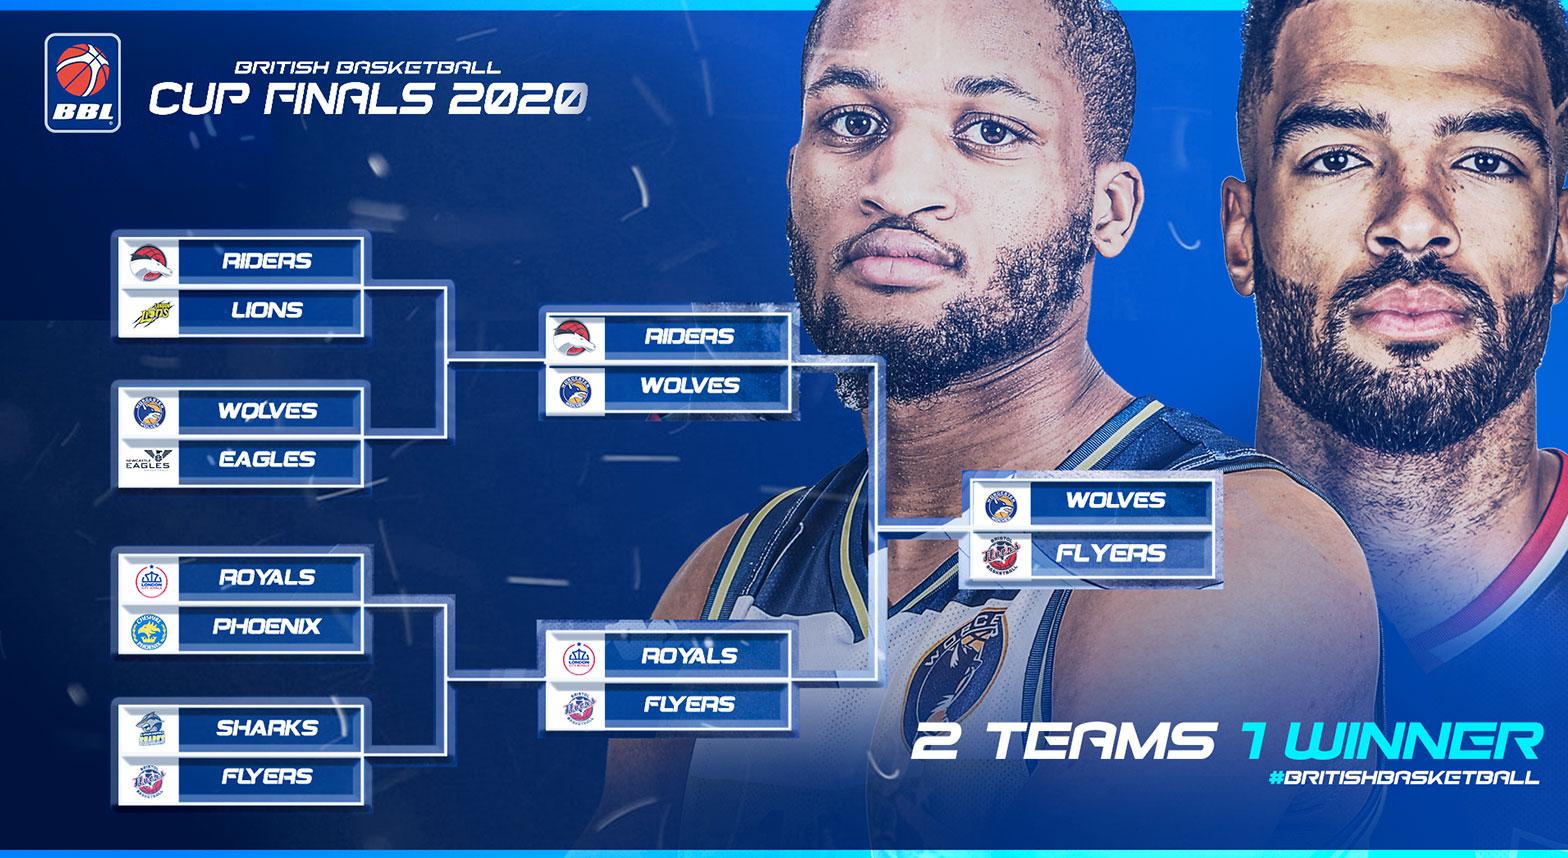 bbl-cup-final-arenasV2.jpg